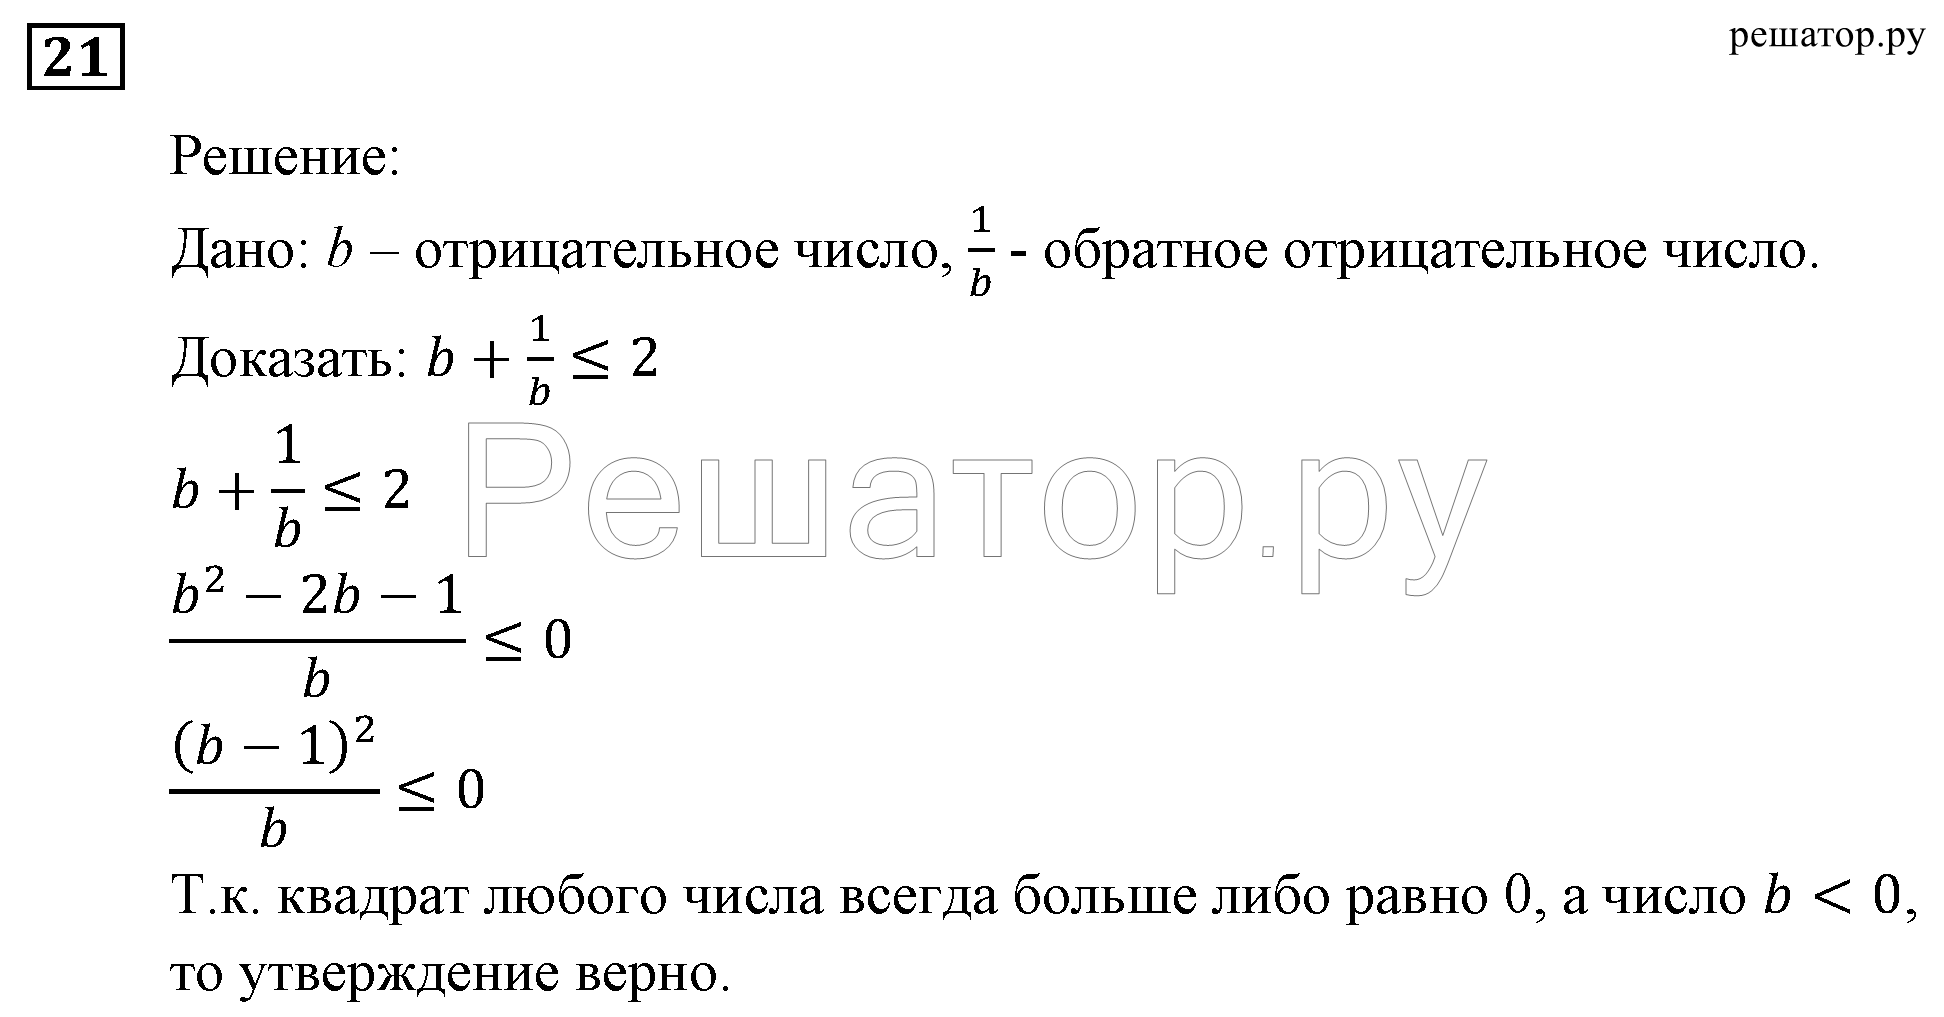 Гдз 9 класс углублённая алгебра мерзляк полонский якир